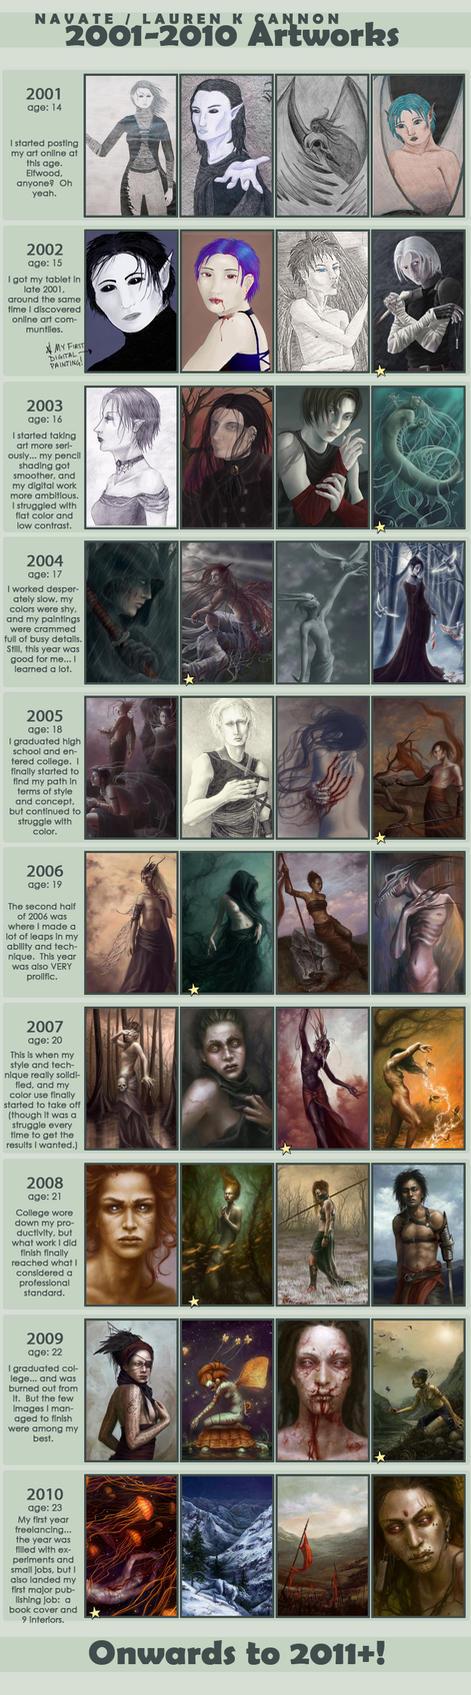 2001-2010 Improvement Meme by navate